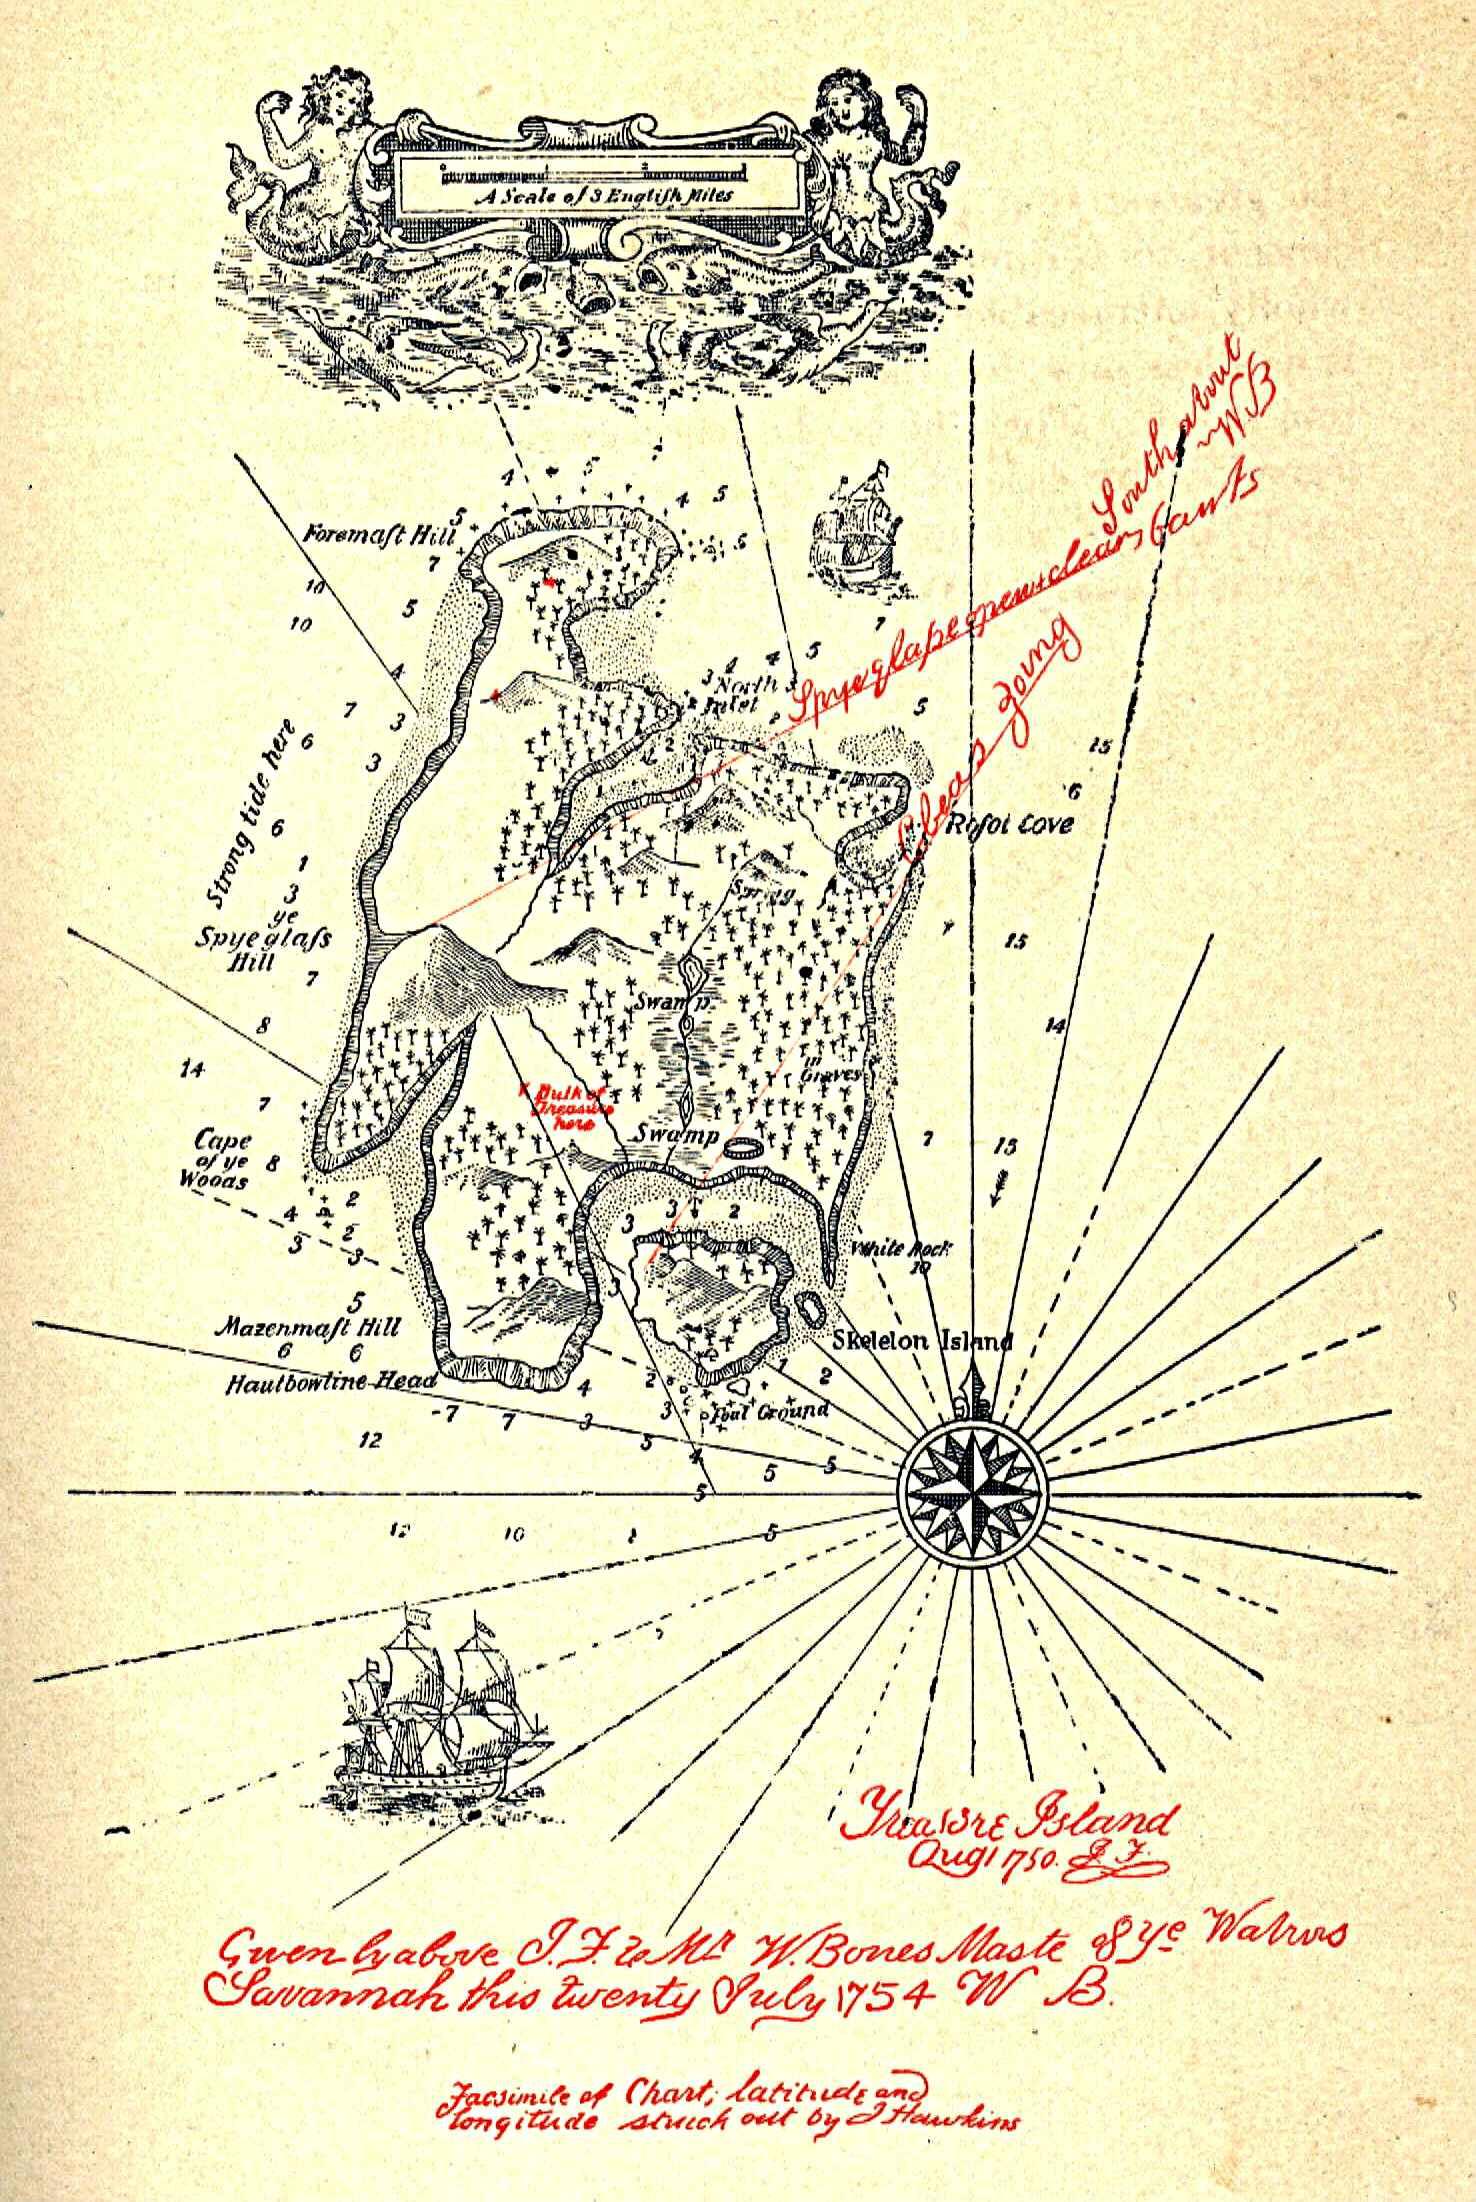 https://upload.wikimedia.org/wikipedia/commons/archive/c/c6/20140127205856%21Treasure-island-map.jpg